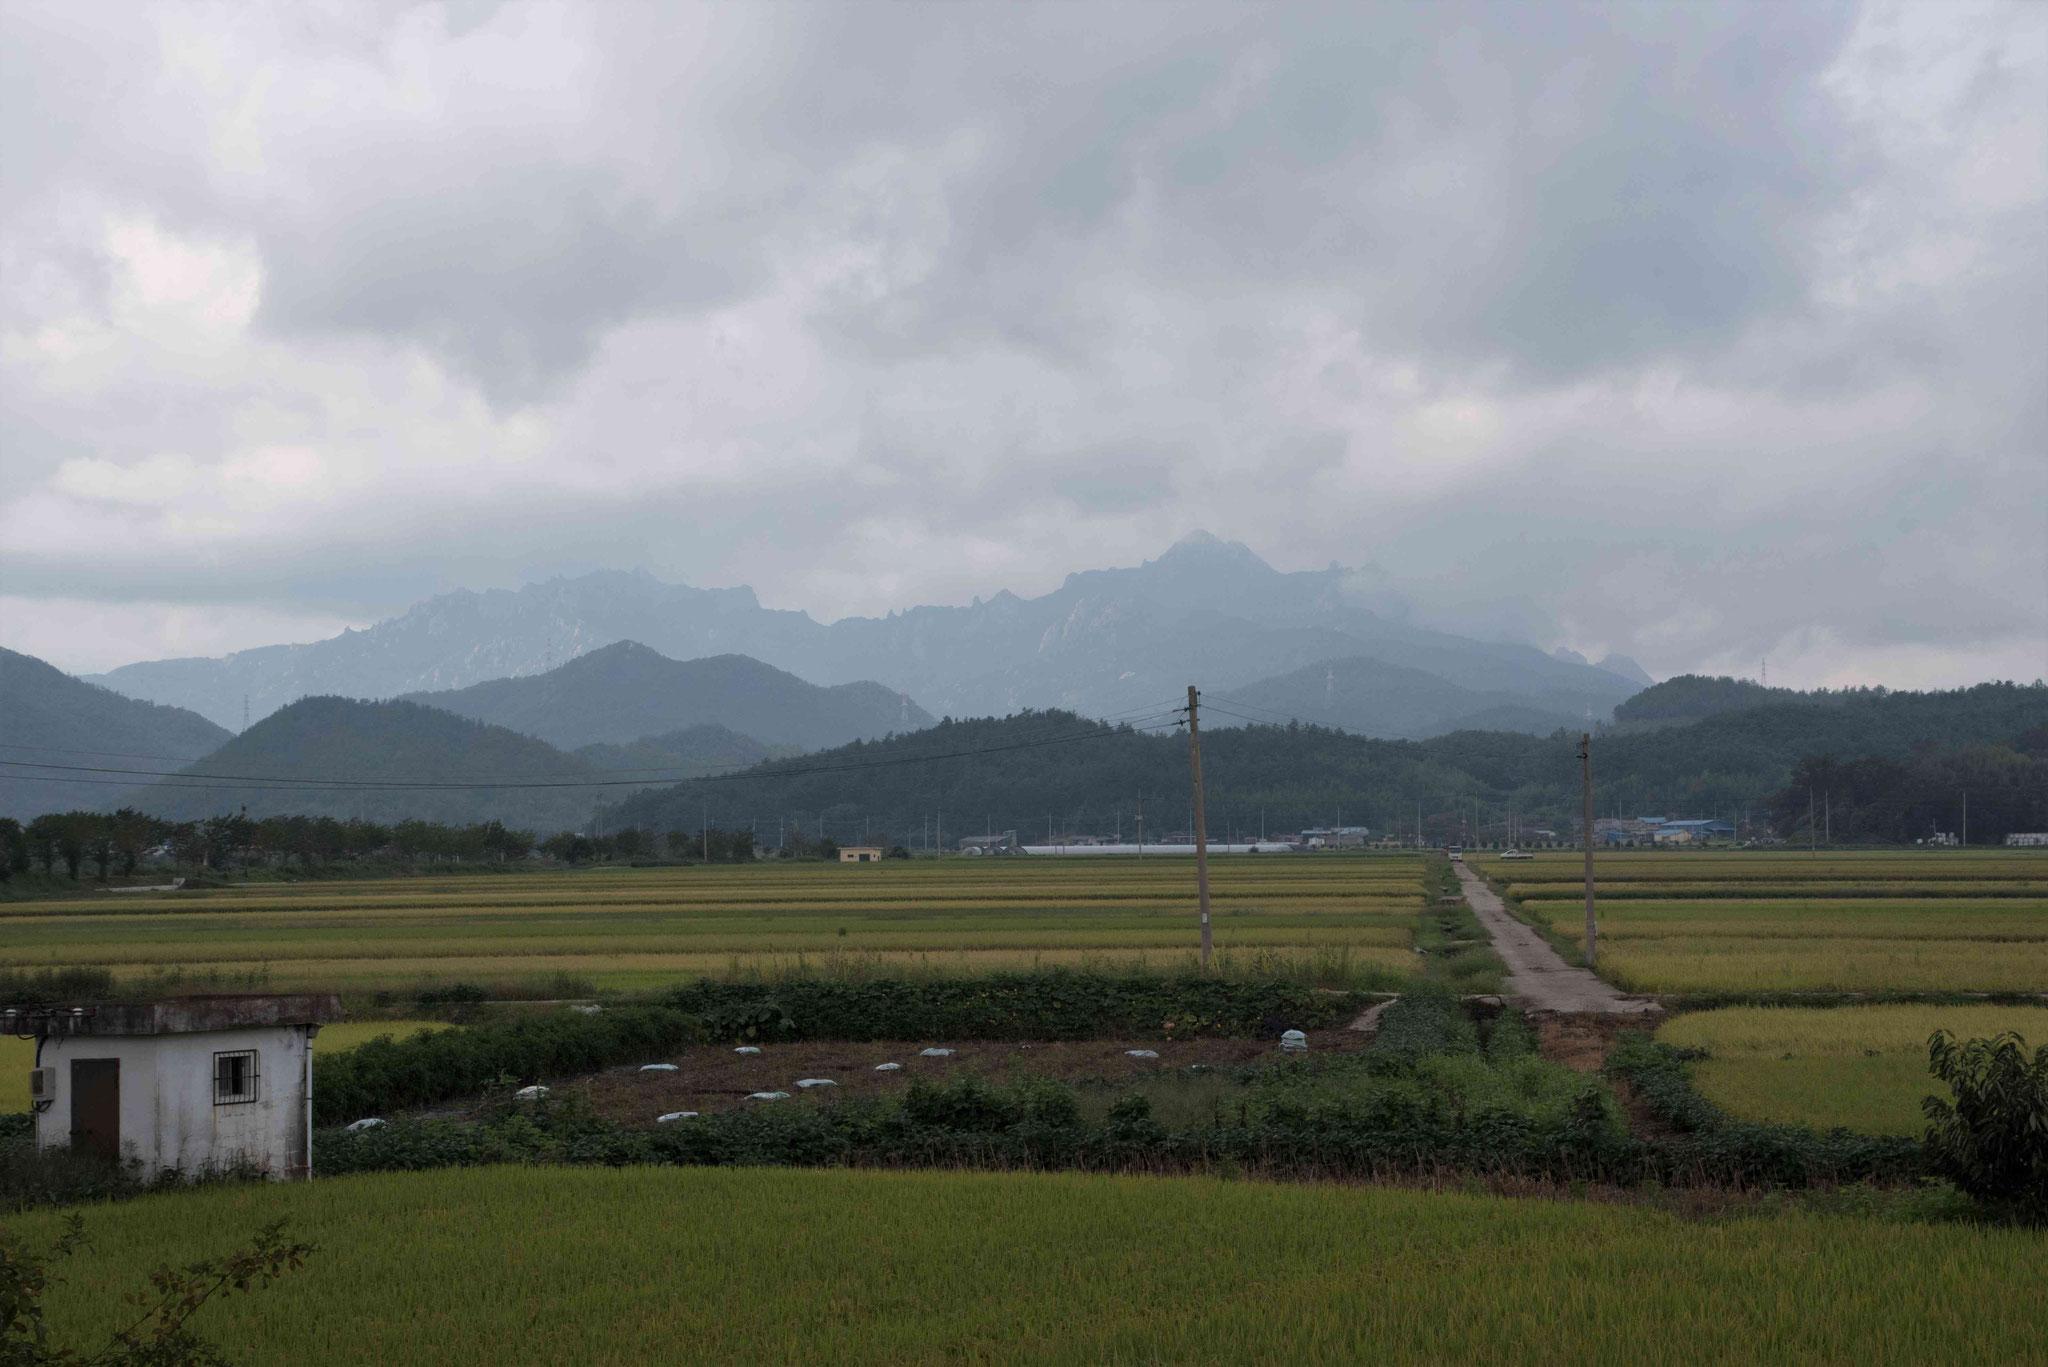 Reisfelder vor den Bergen im Südwesten vor Mokpo